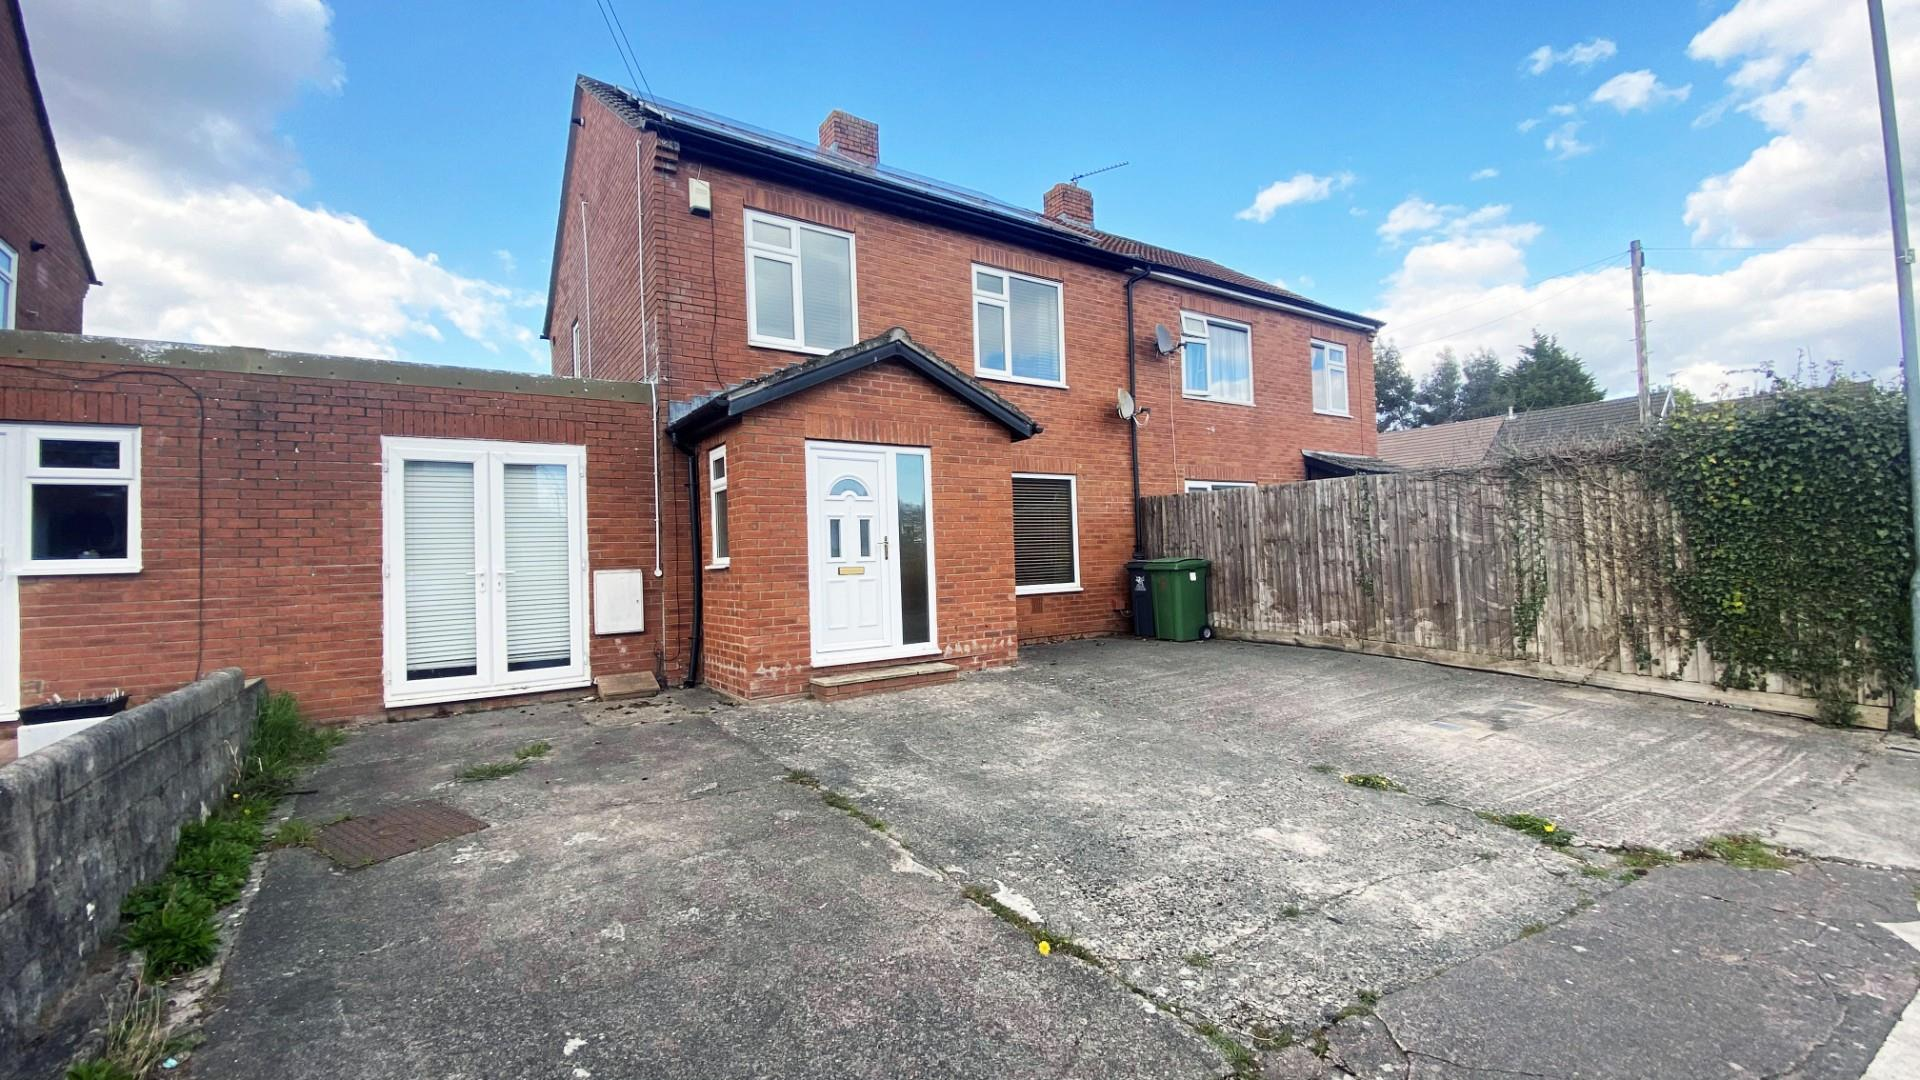 3 bed semi-detached house for sale in Coed Cochwyn Avenue, Cardiff, CF14